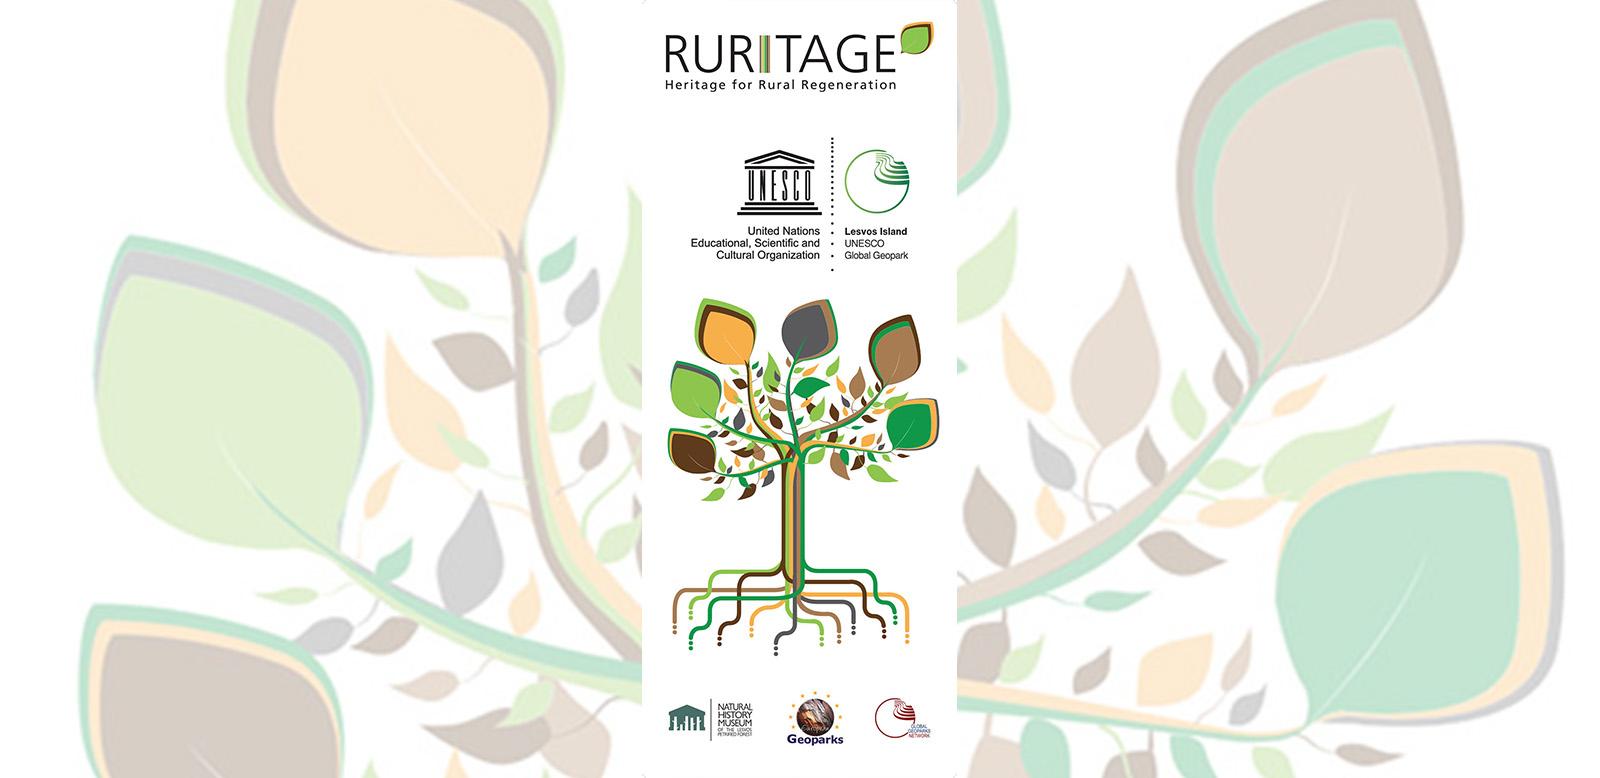 ruritage